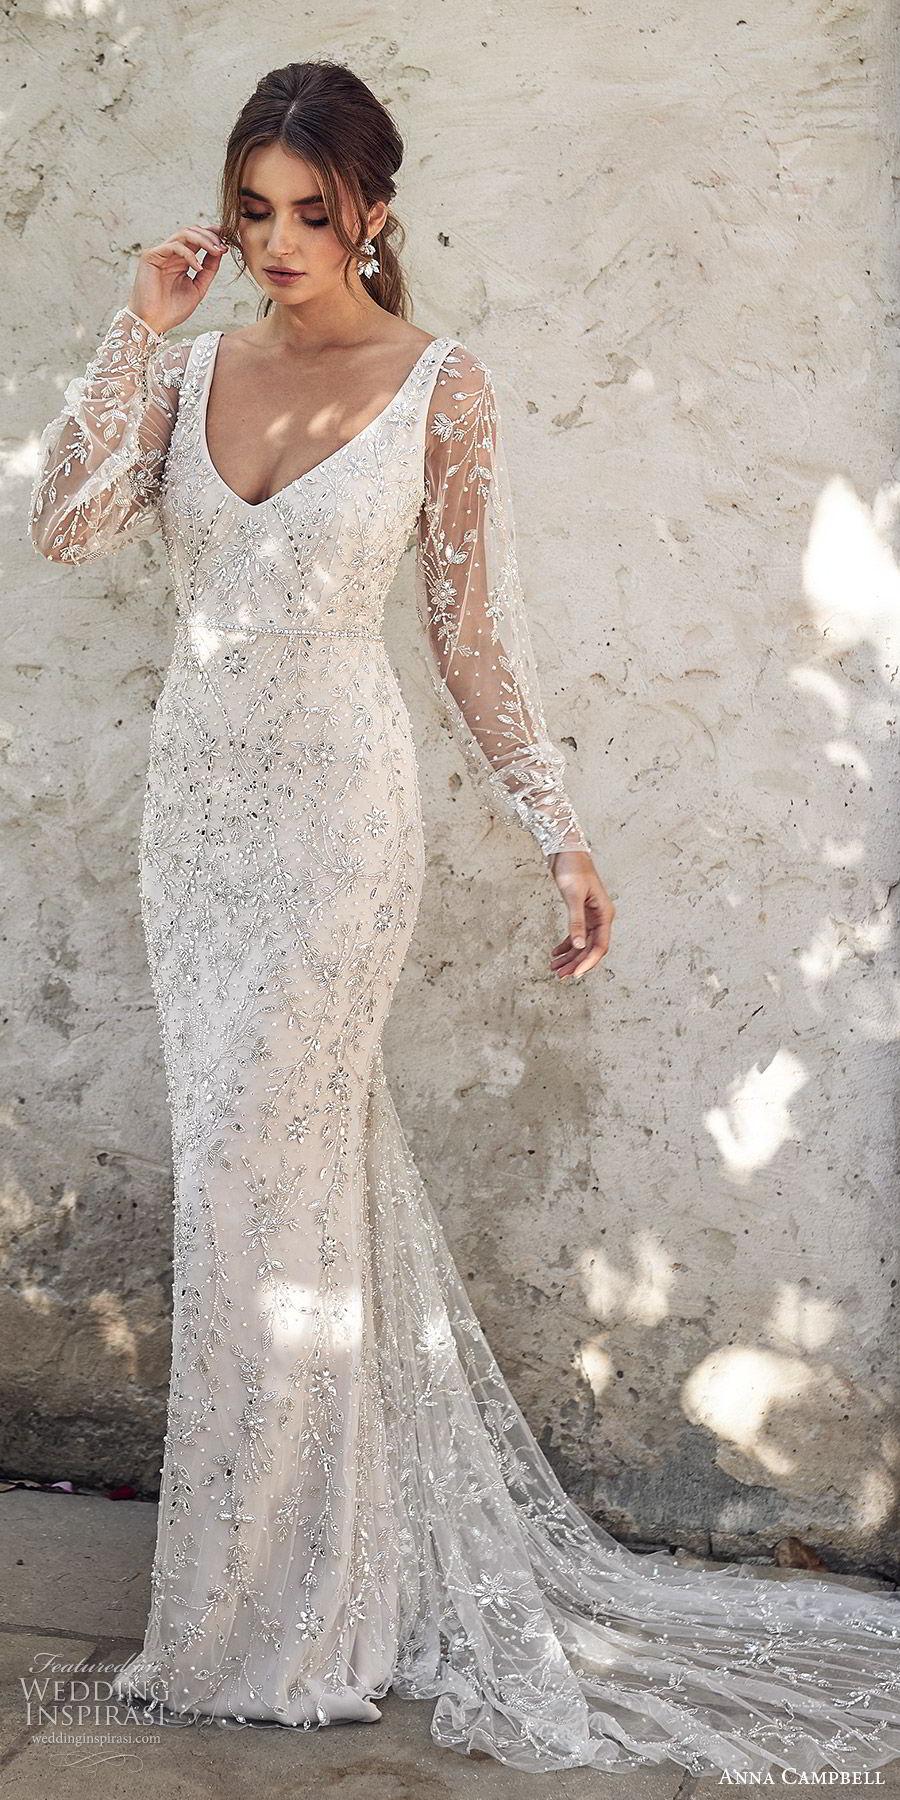 anna campbell 2020 bridal illusion bishop sleeves v neckline fully embellished trumpet mermaid sheath wedding dress (1) glam elegant glitzy scoop back chapel train mv